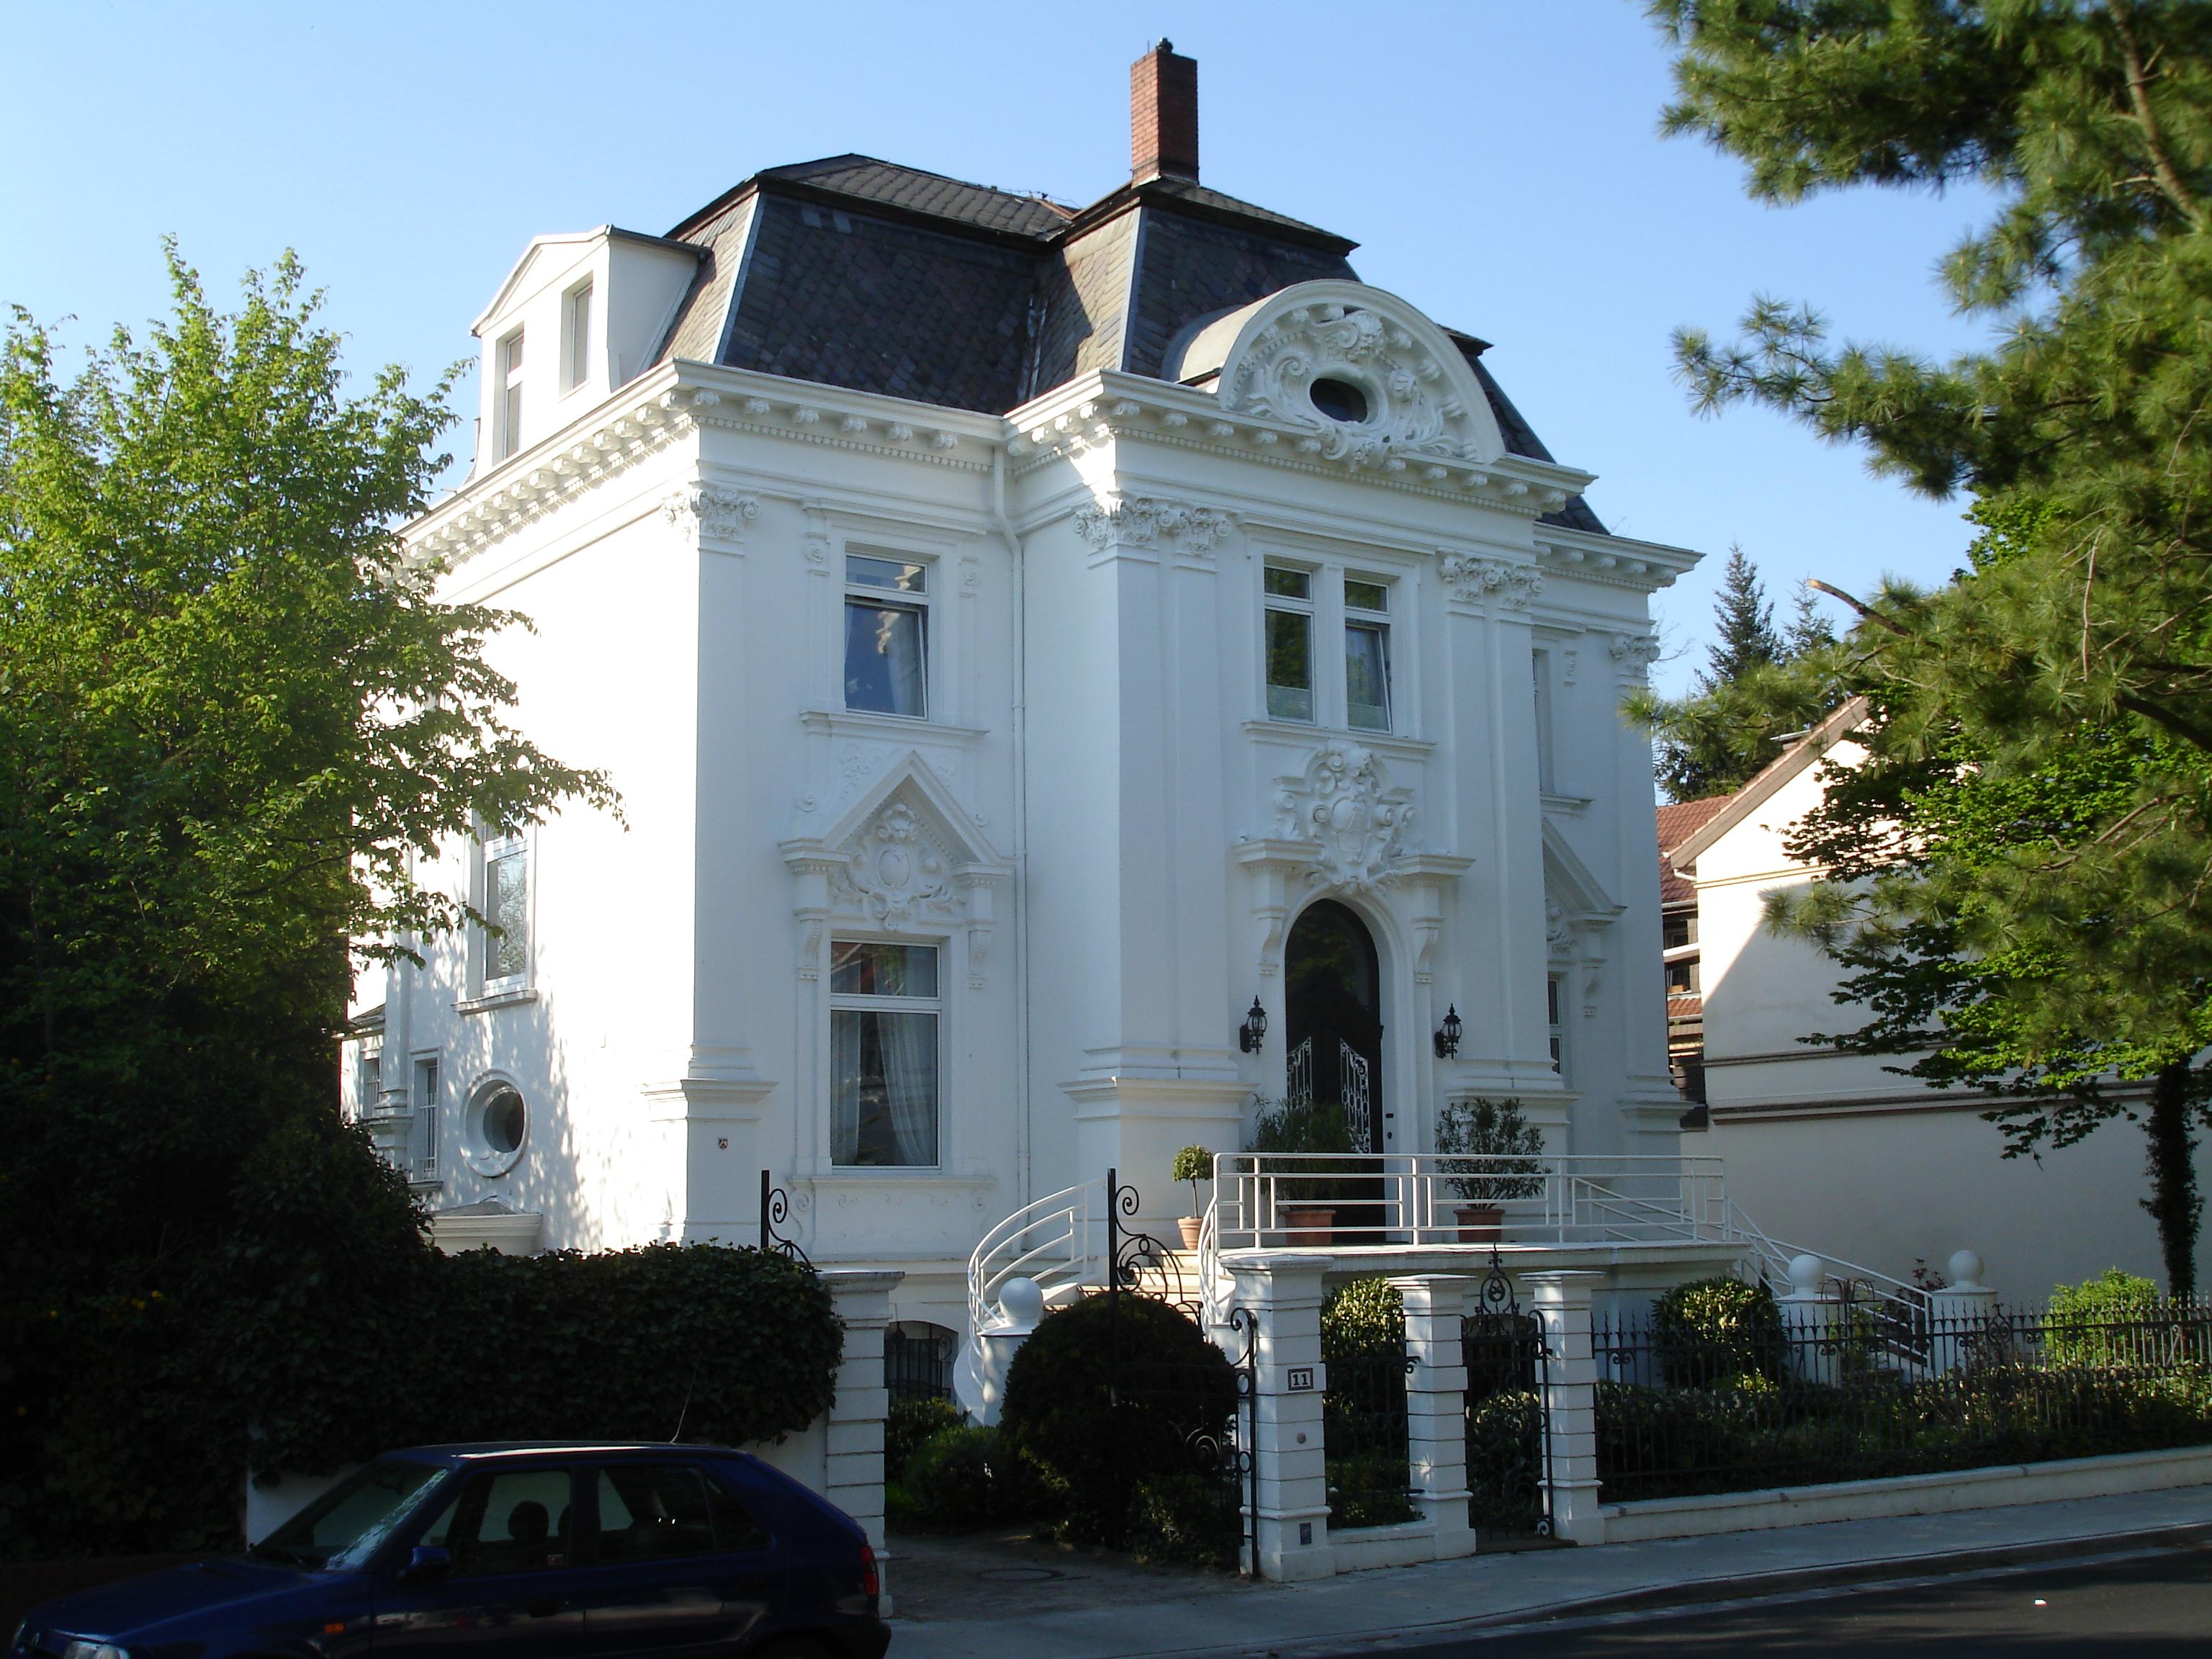 Tönnies Villa